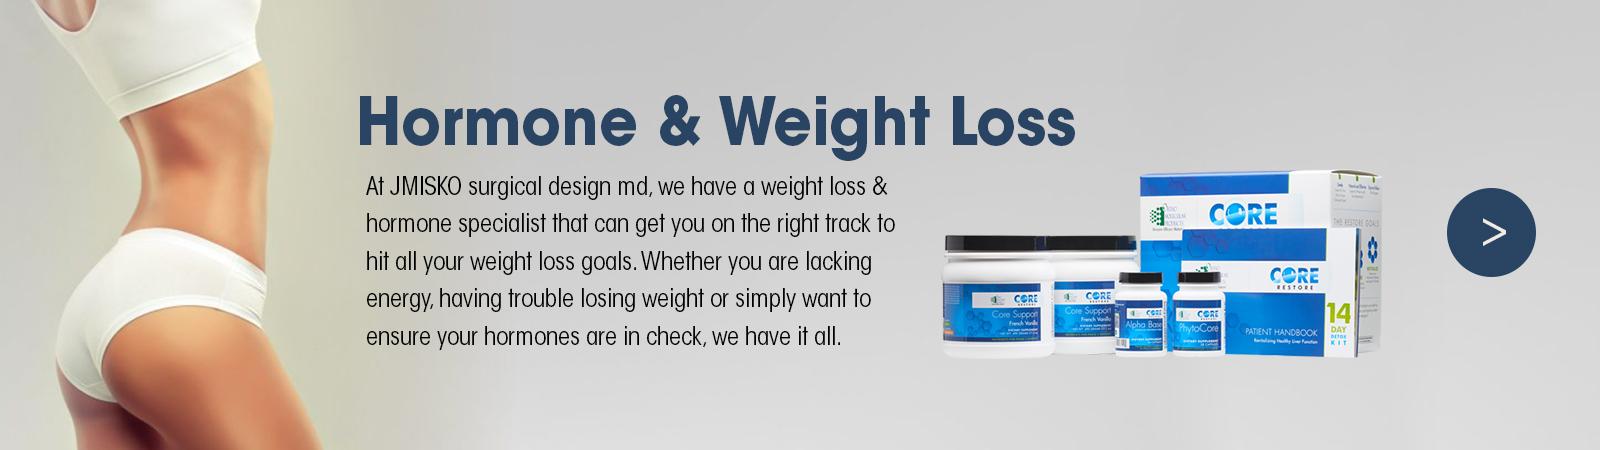 How yo lose weight image 7